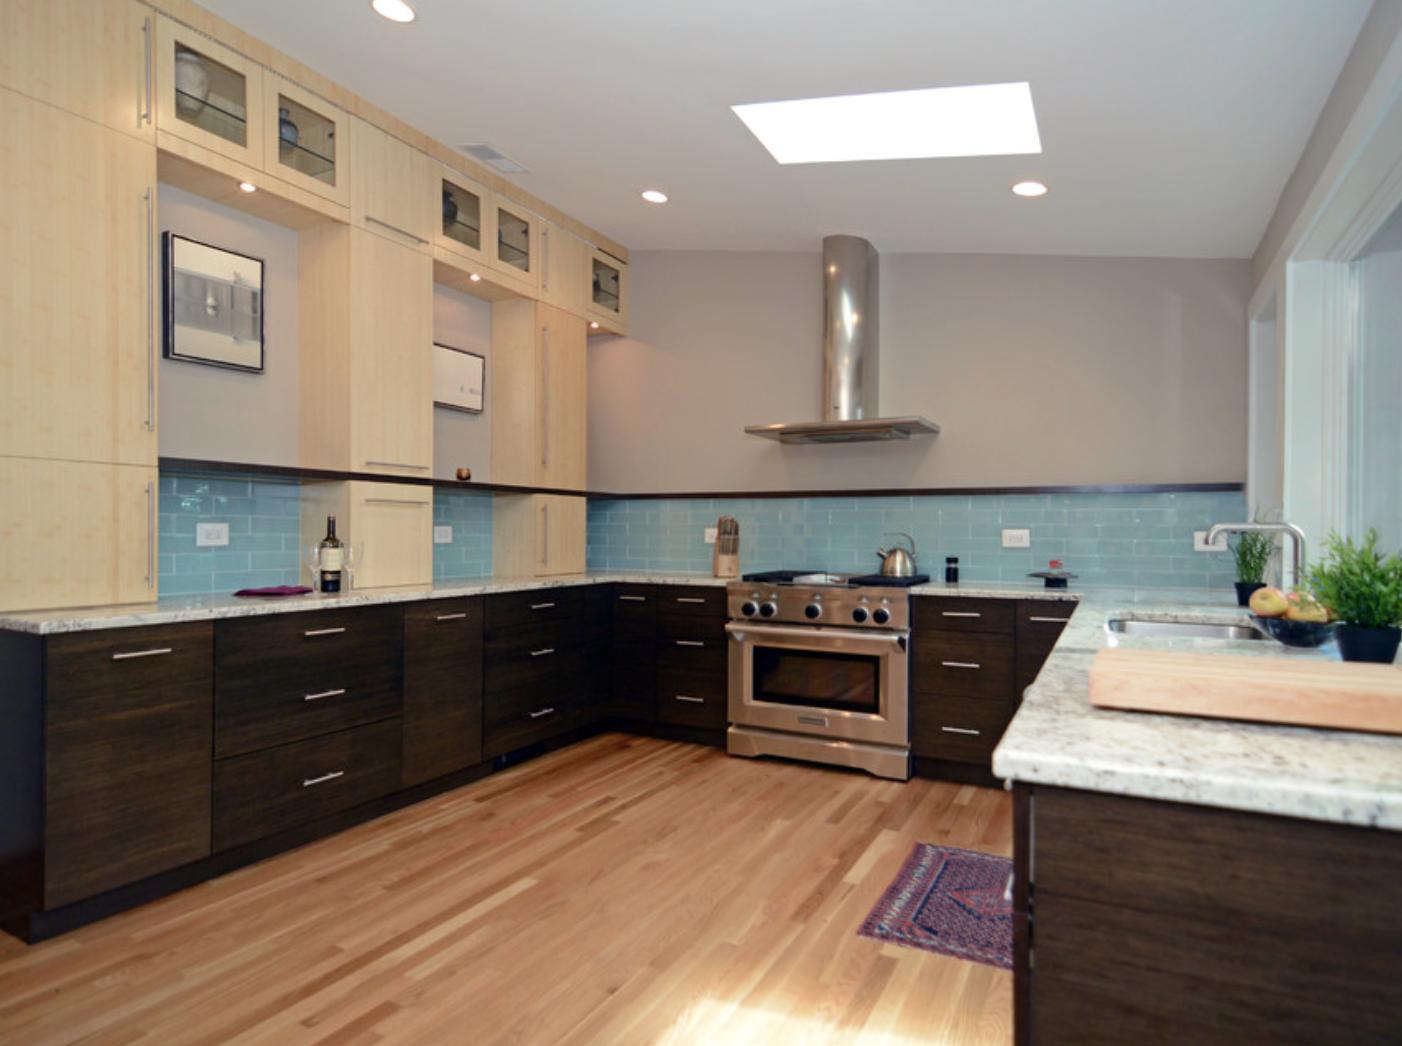 Beautiful Kitchen Design 5 Simple Steps  Case Design Blog  Home Glamorous Kitchen Design Blog Design Decoration